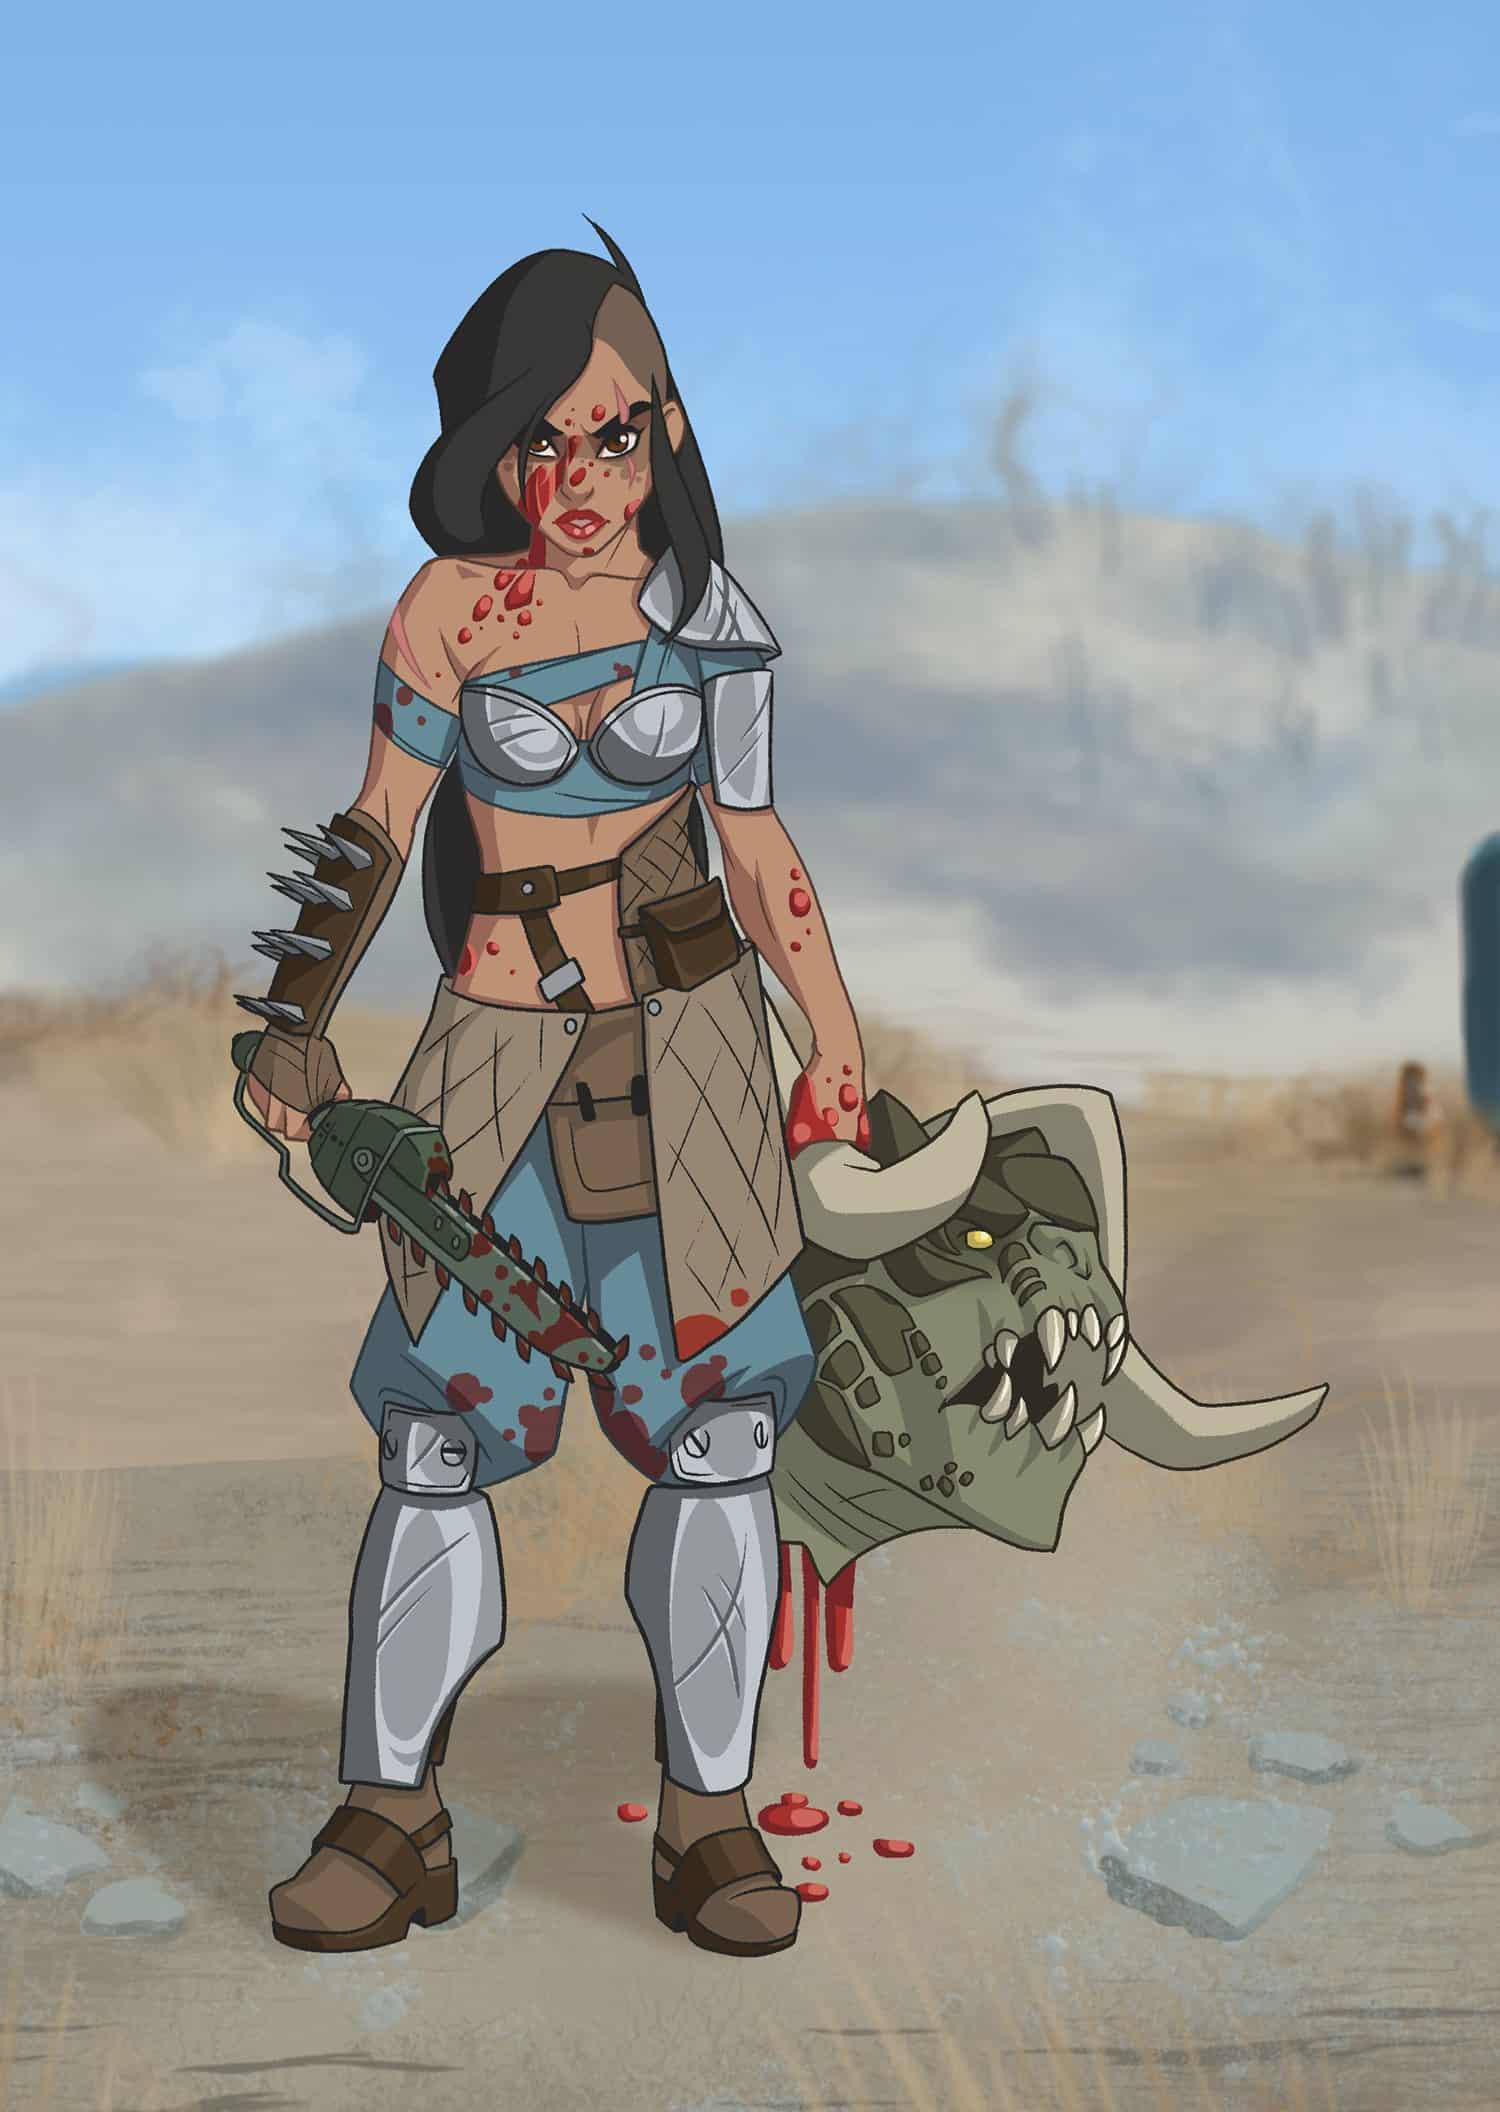 raider-princess-jasmine-fallout-pinup-girl